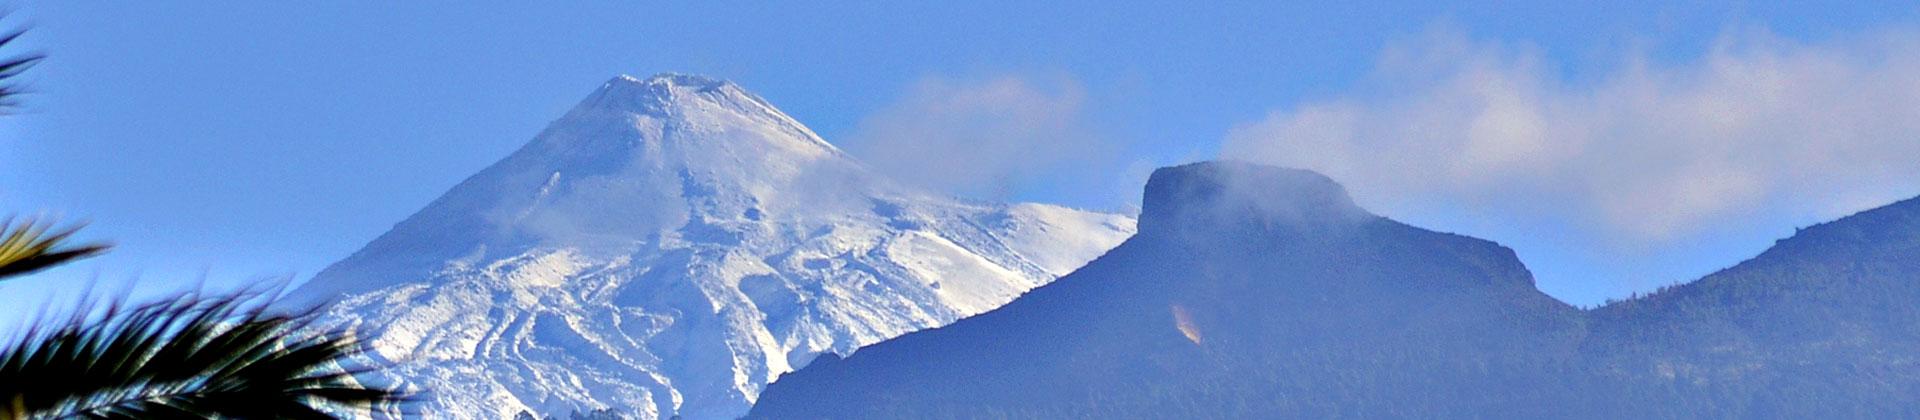 https://www.goodmorningtenerife.com/wp-content/uploads/2014/08/05_slide_teide_GM_Tenerife.jpg